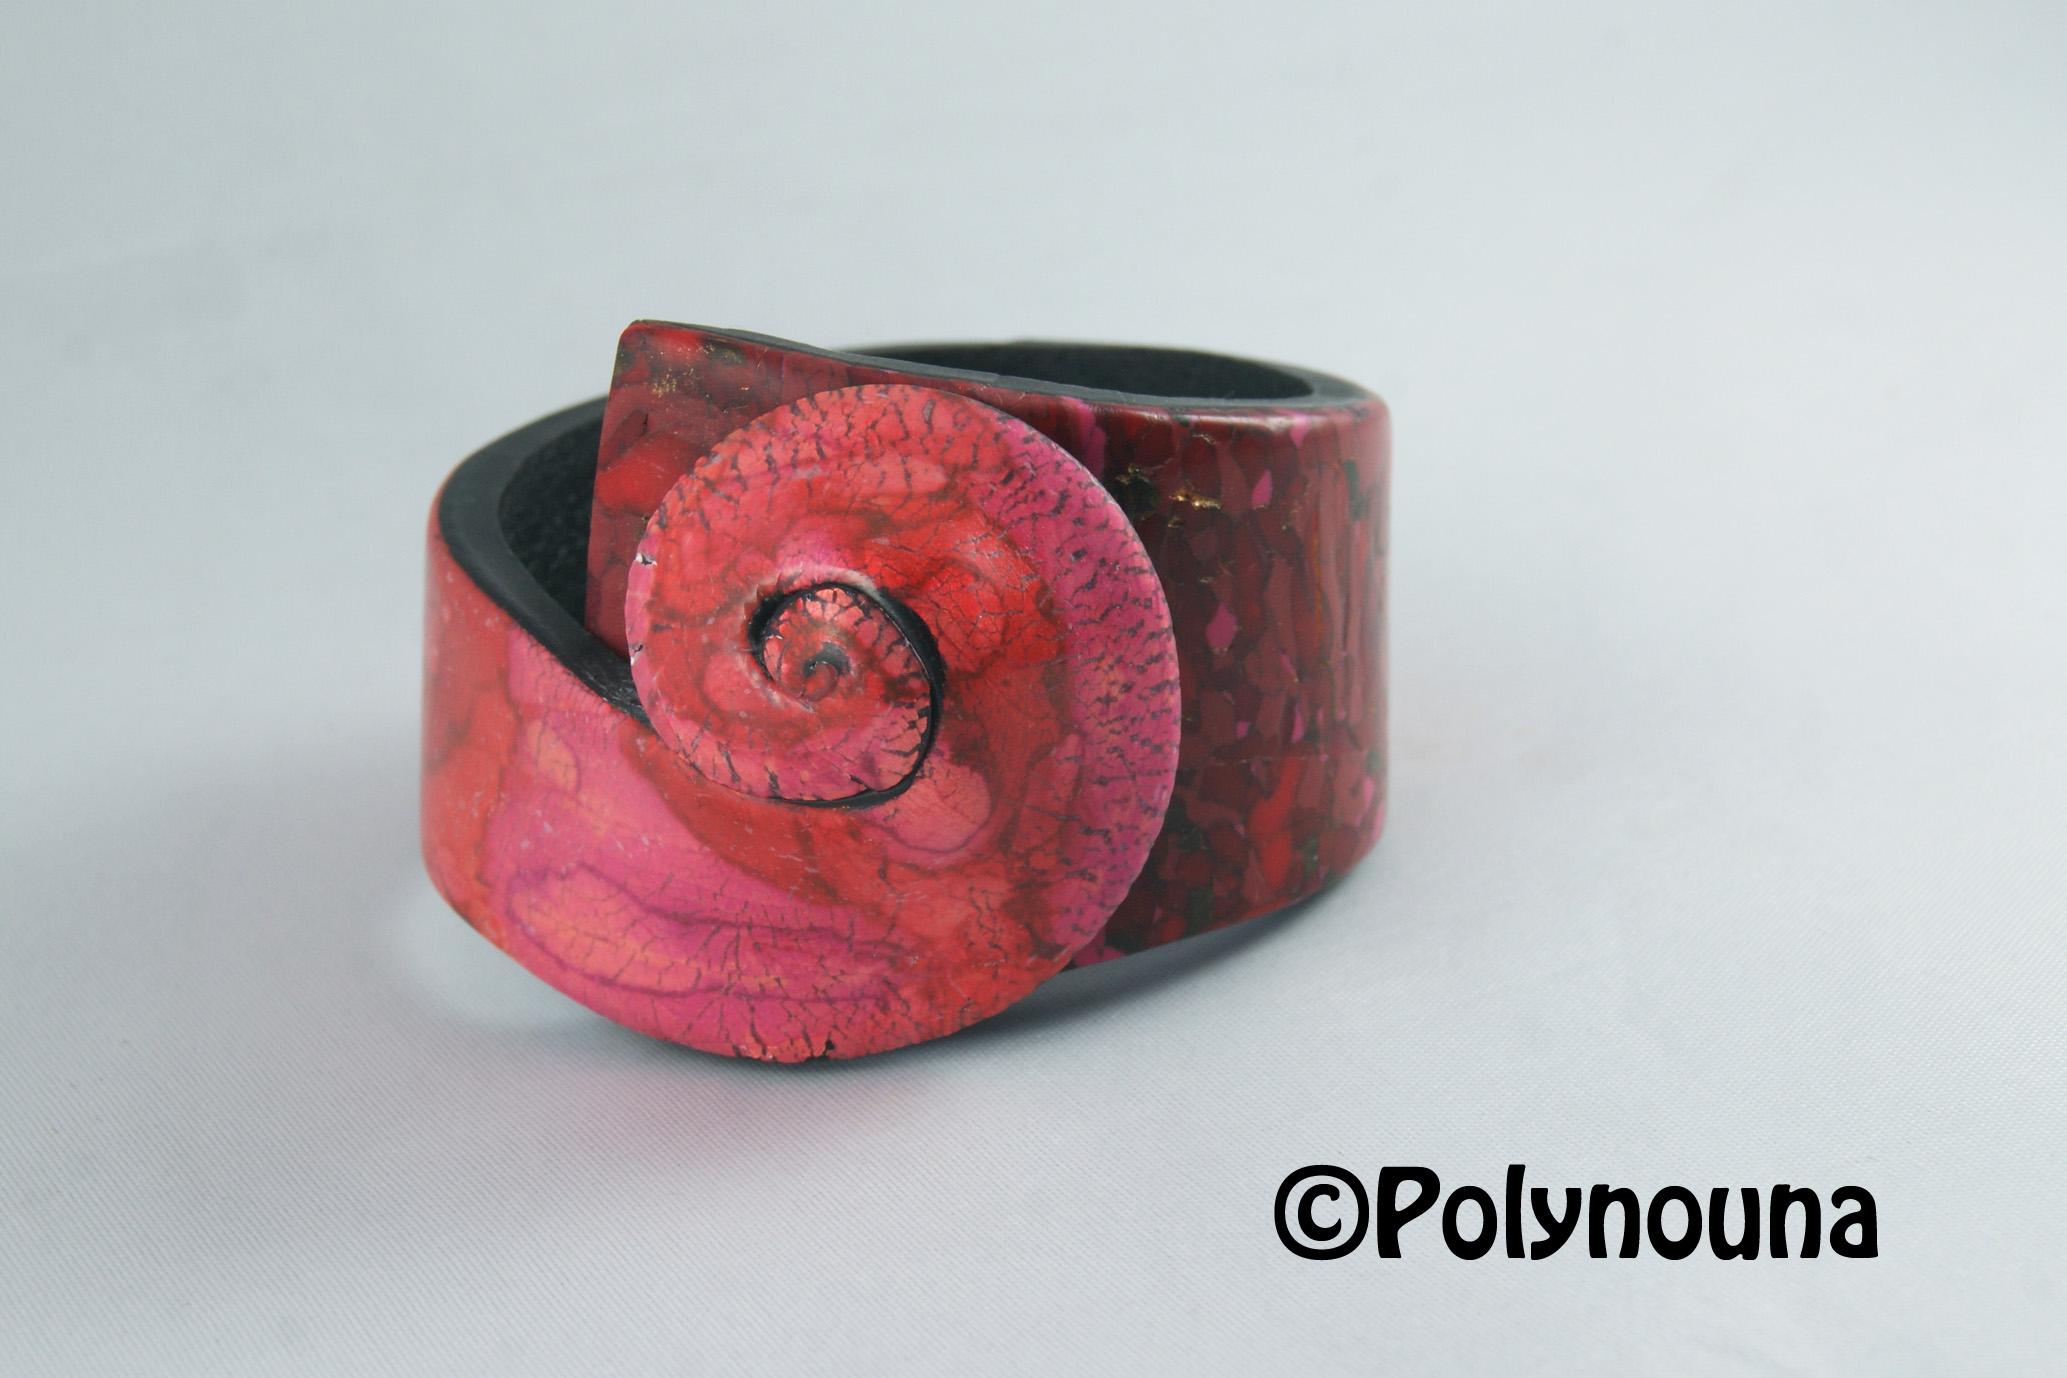 Atelier Polynouna - Artisanat d'art